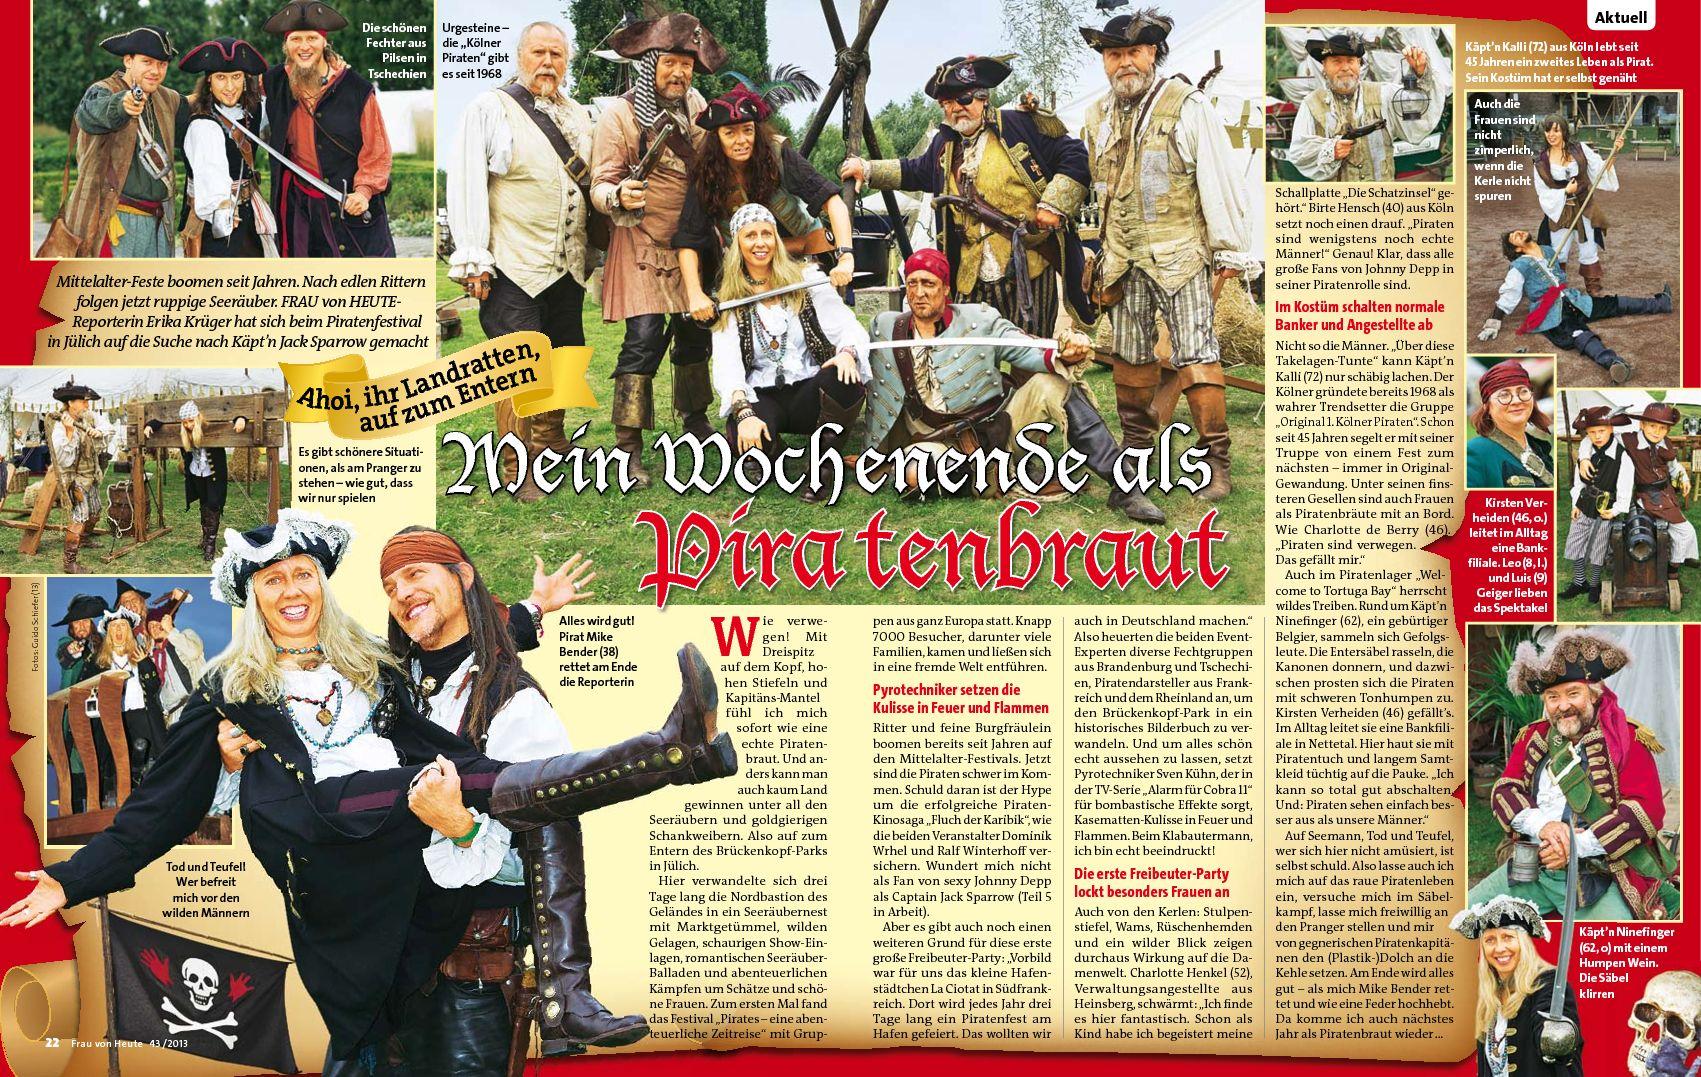 Frau von Heute, Ausgabe 4 / 2013